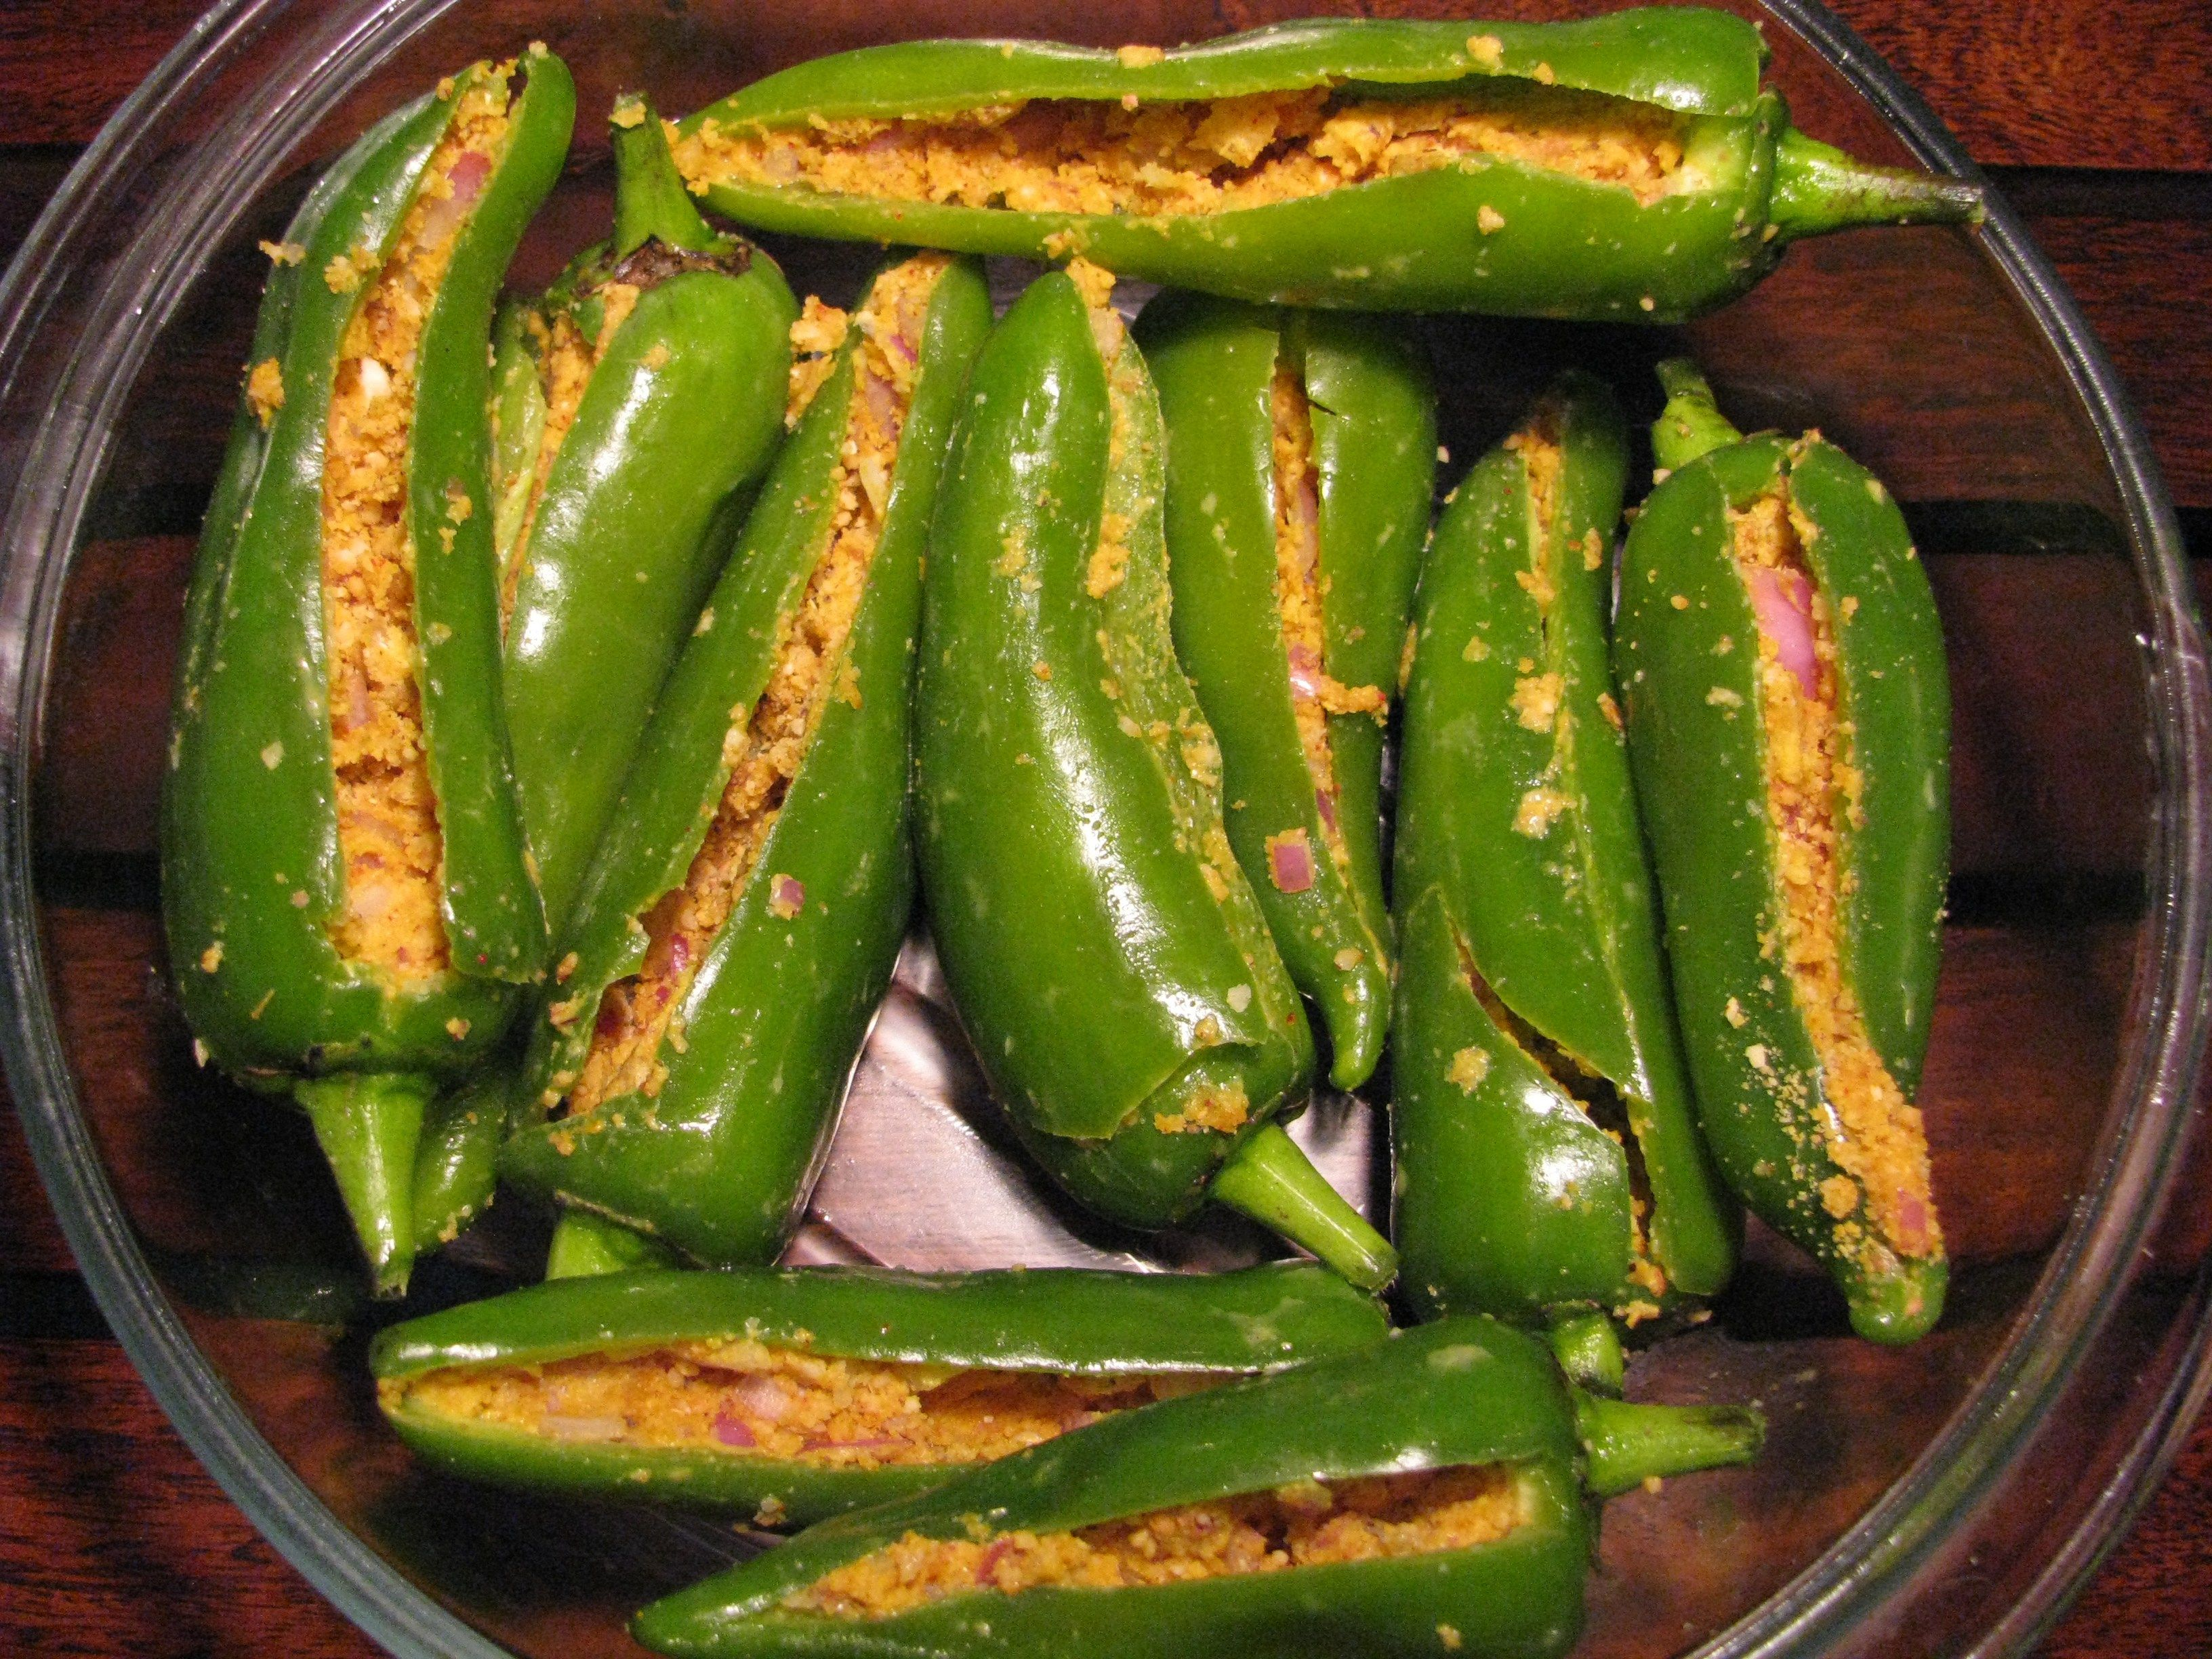 Stuffed Green Chilies Bhavnagri Mirch Stuffed Peppers Vegetarian Stuffed Peppers Healthy Veg Recipes